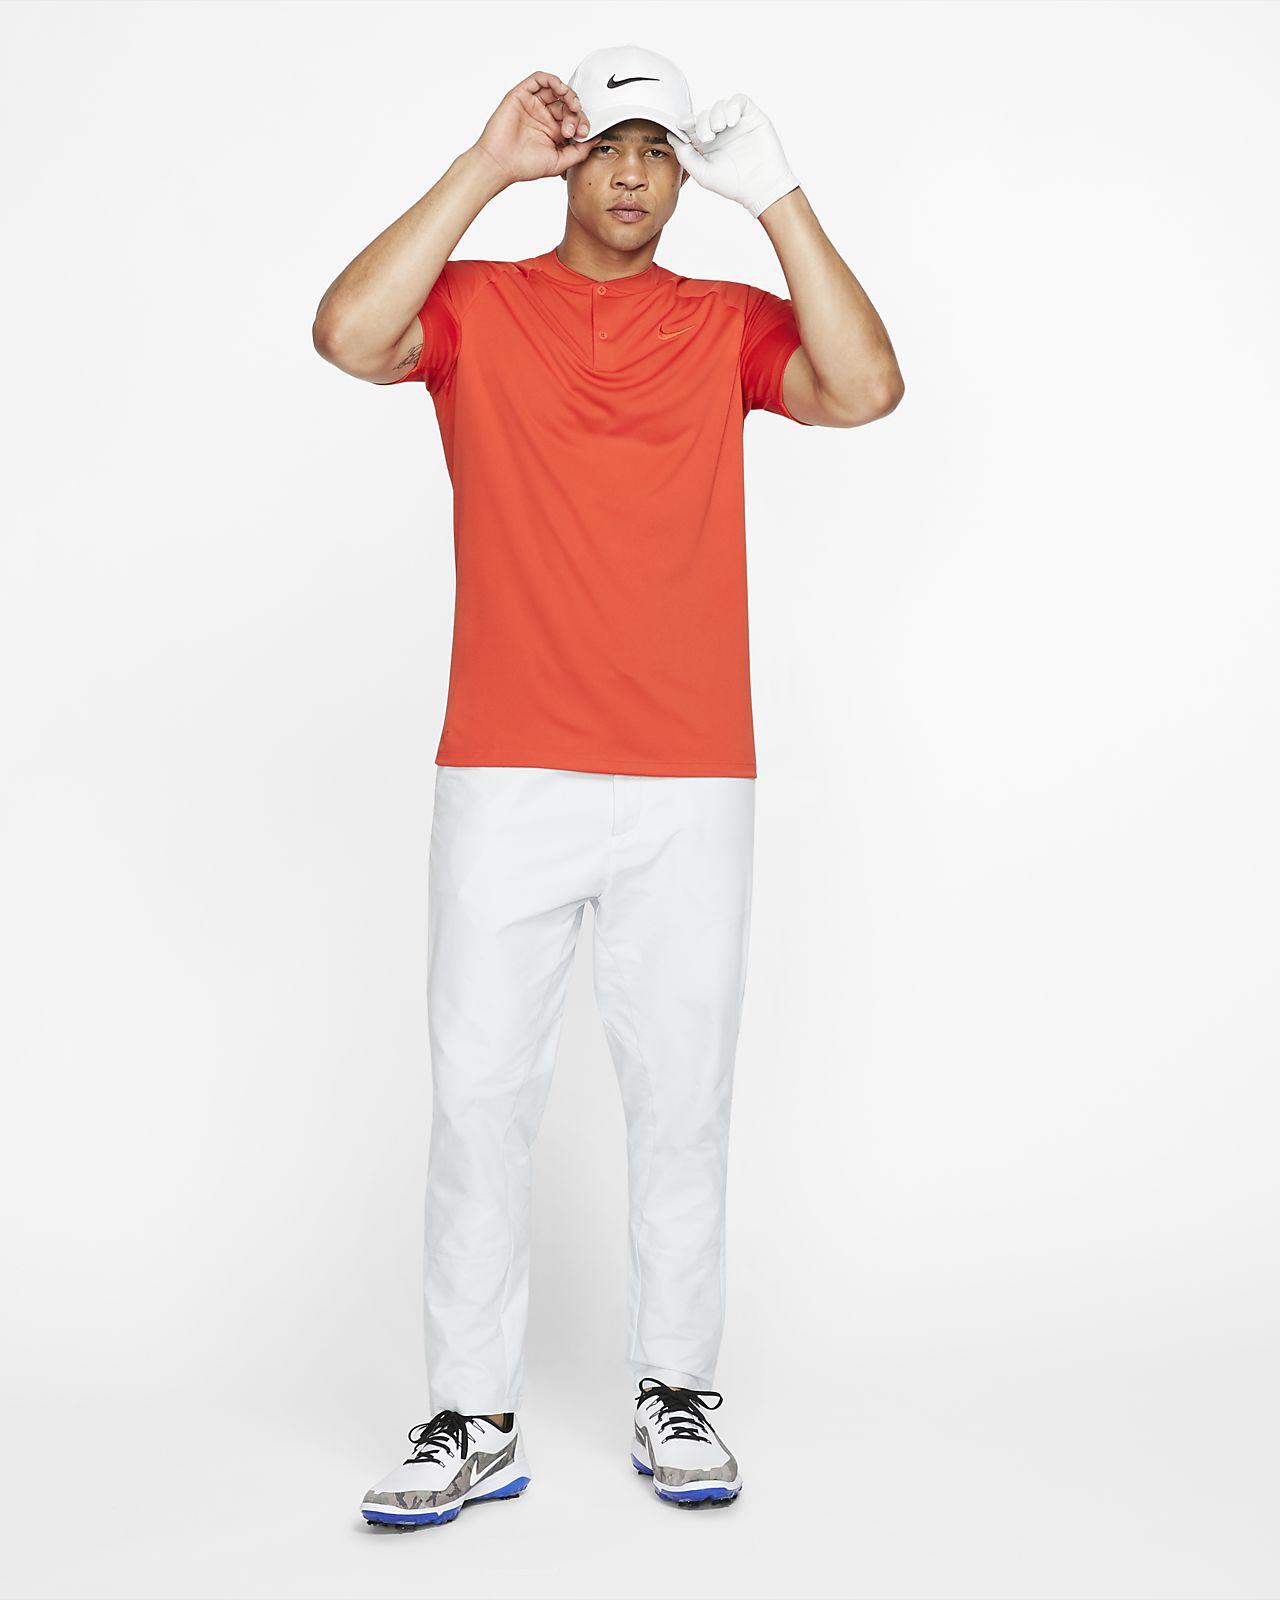 b93a93b24bc3 Nike Dri-FIT Momentum Men s Standard Fit Golf Polo. Nike.com